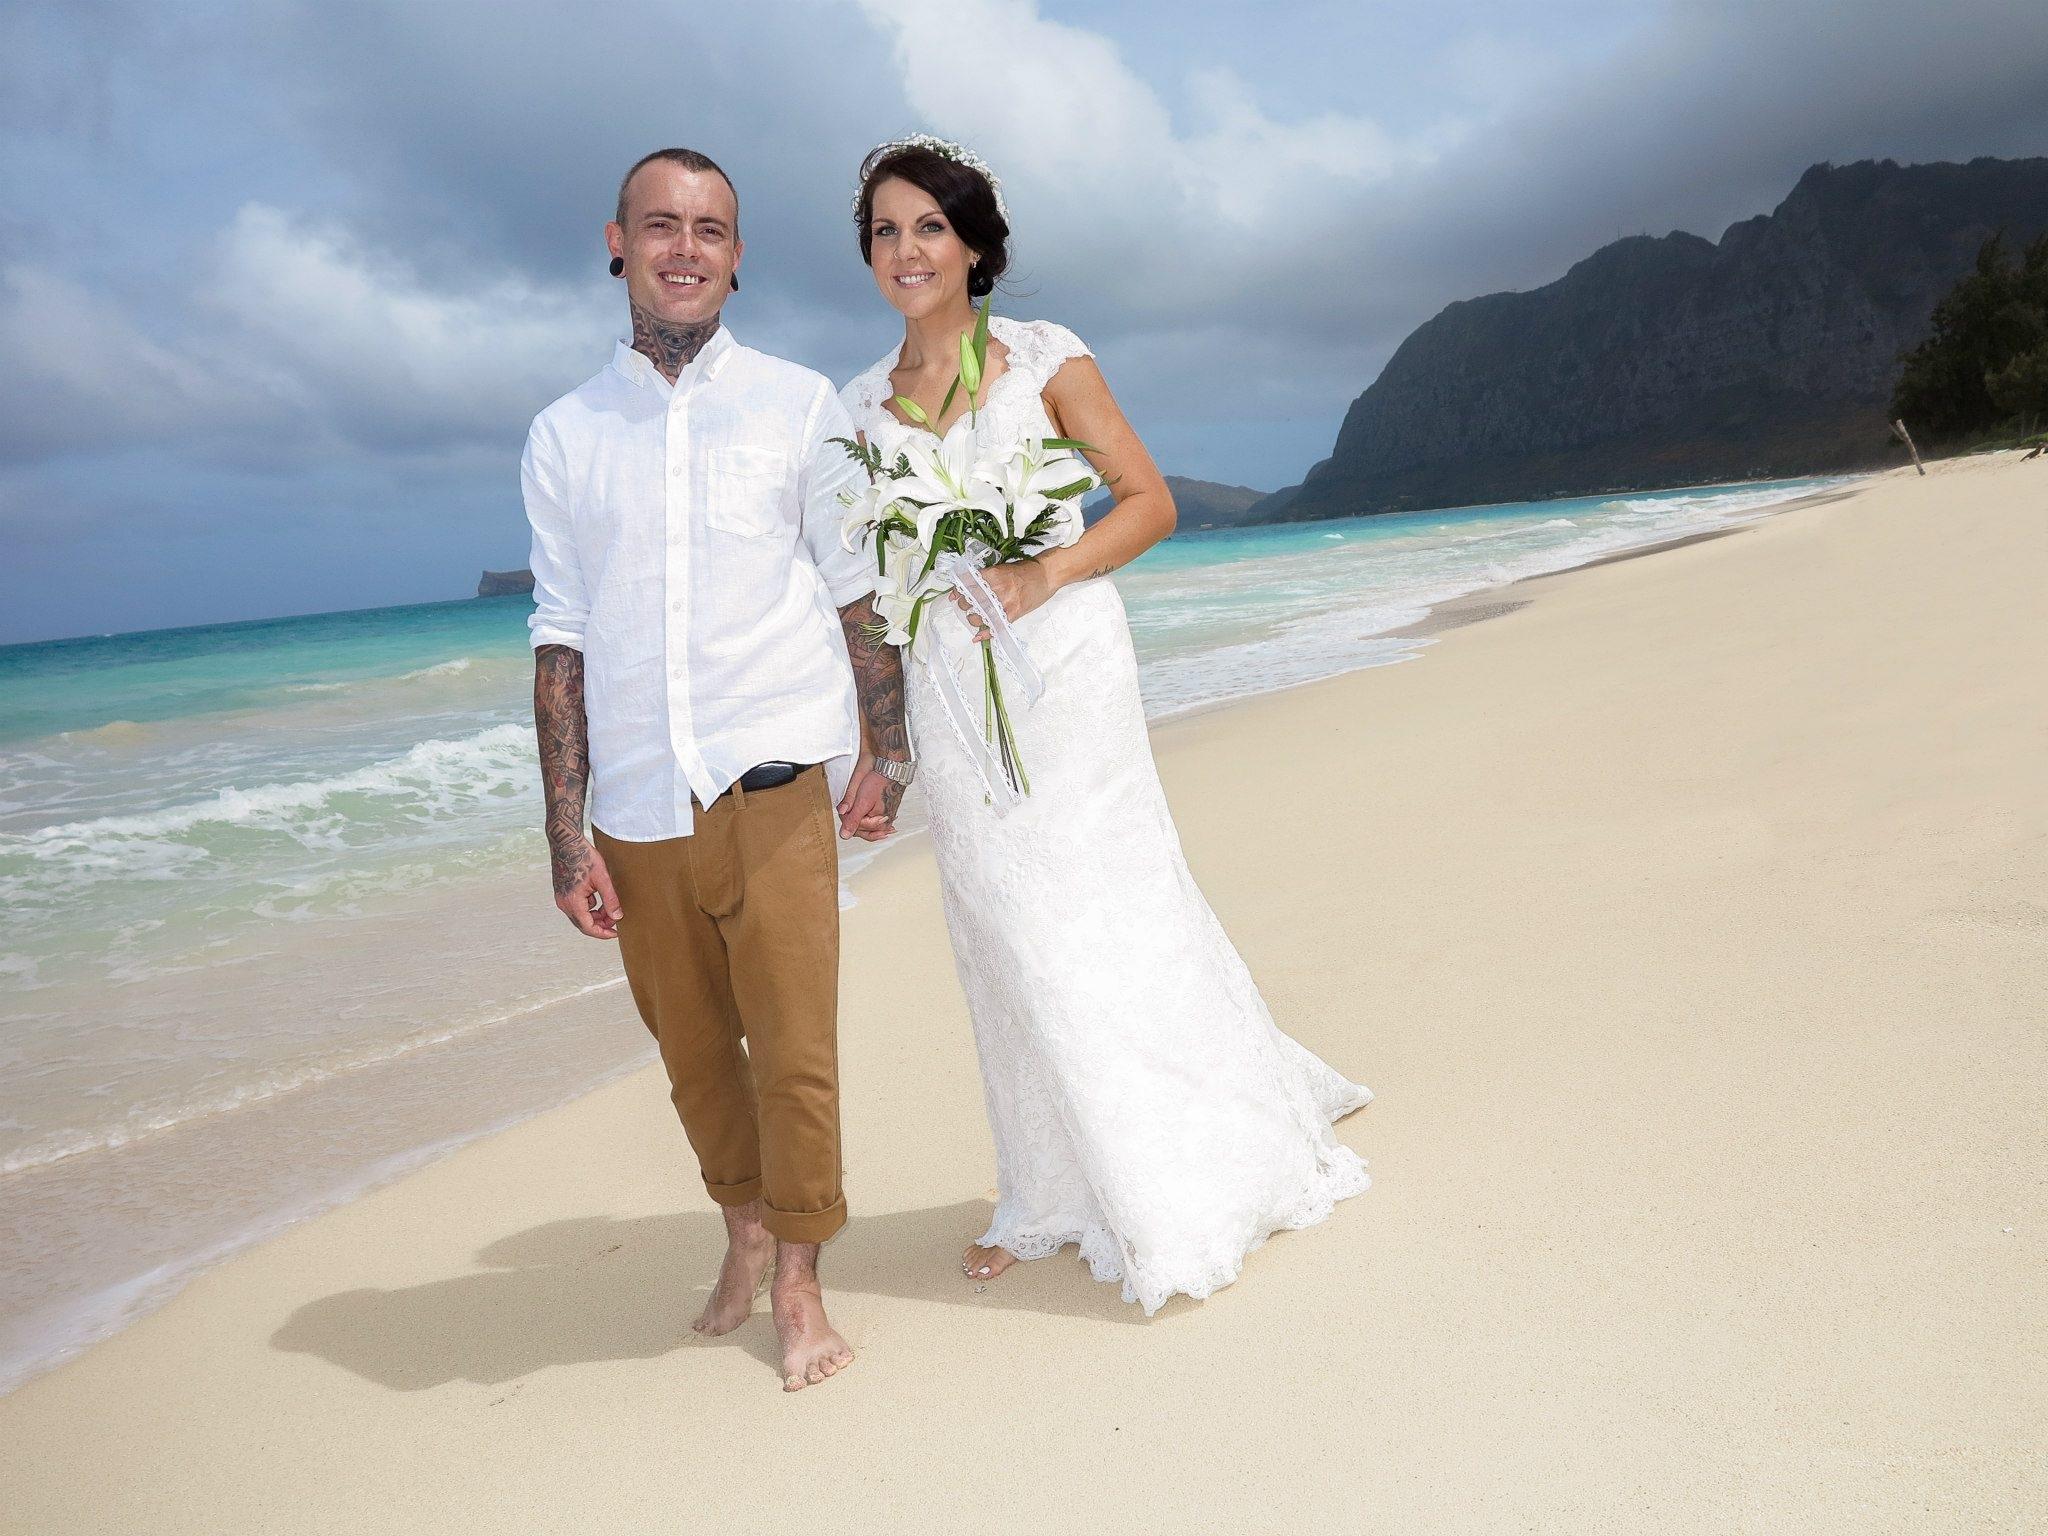 19d82fa72a68 mand kvinde hawaii bryllup bryllupskjole brud Brudgom ceremoni kjole  fotografi pakker kjole Photo shoot brude tøj